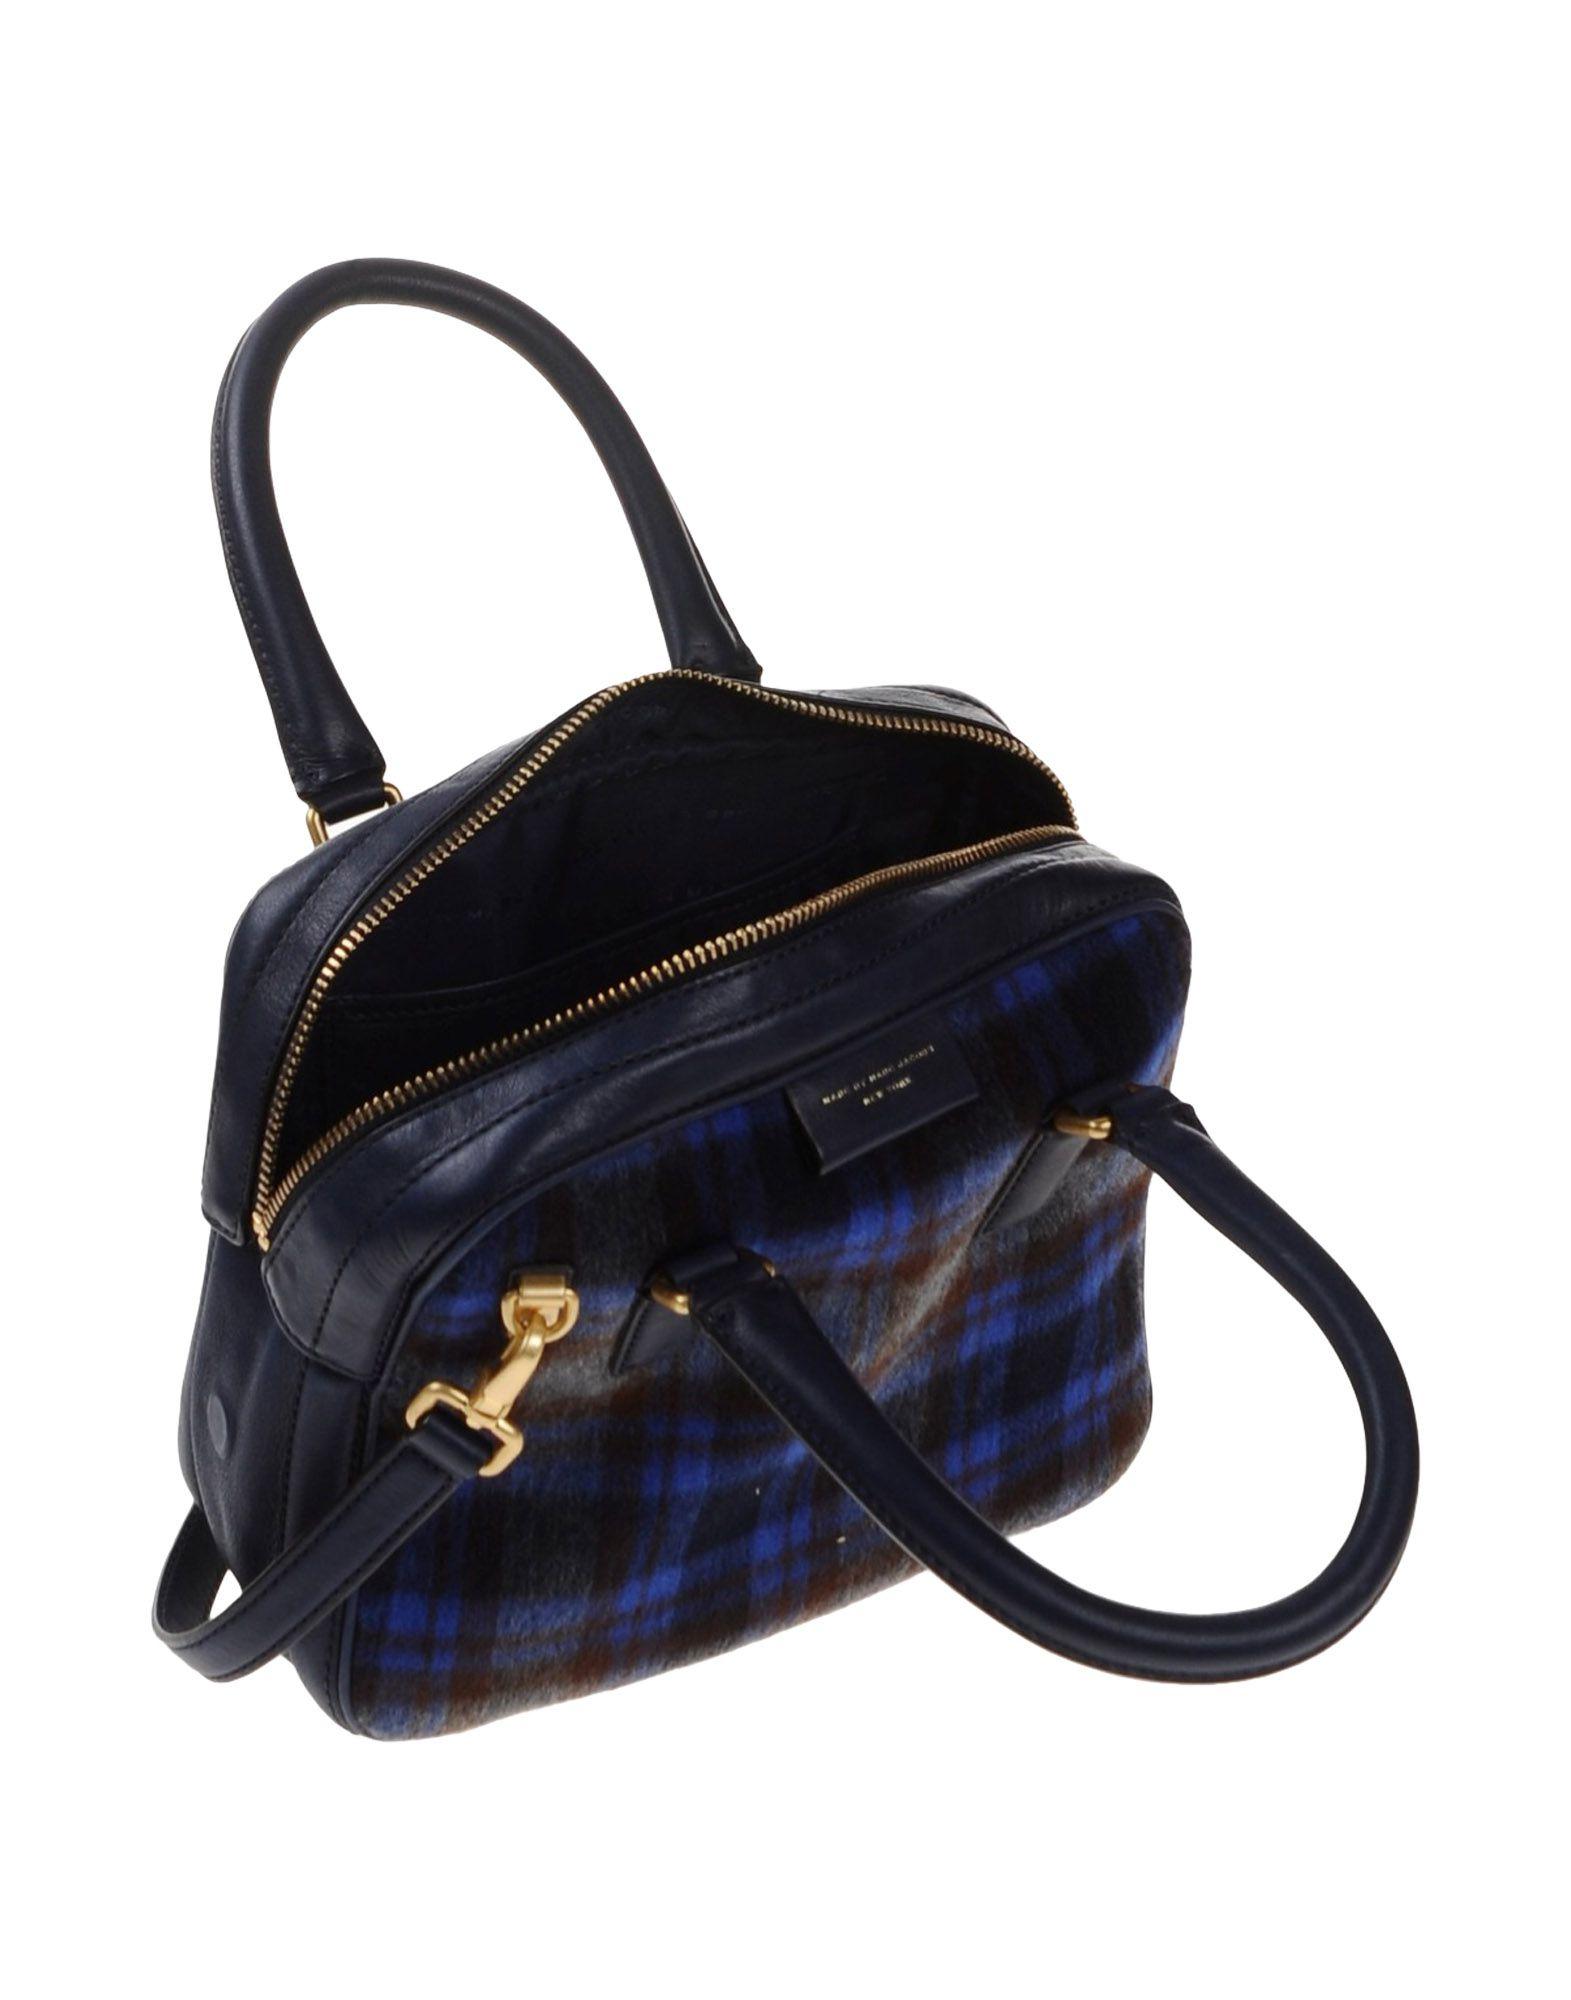 Marc by marc jacobs Handbag in Blue   Lyst